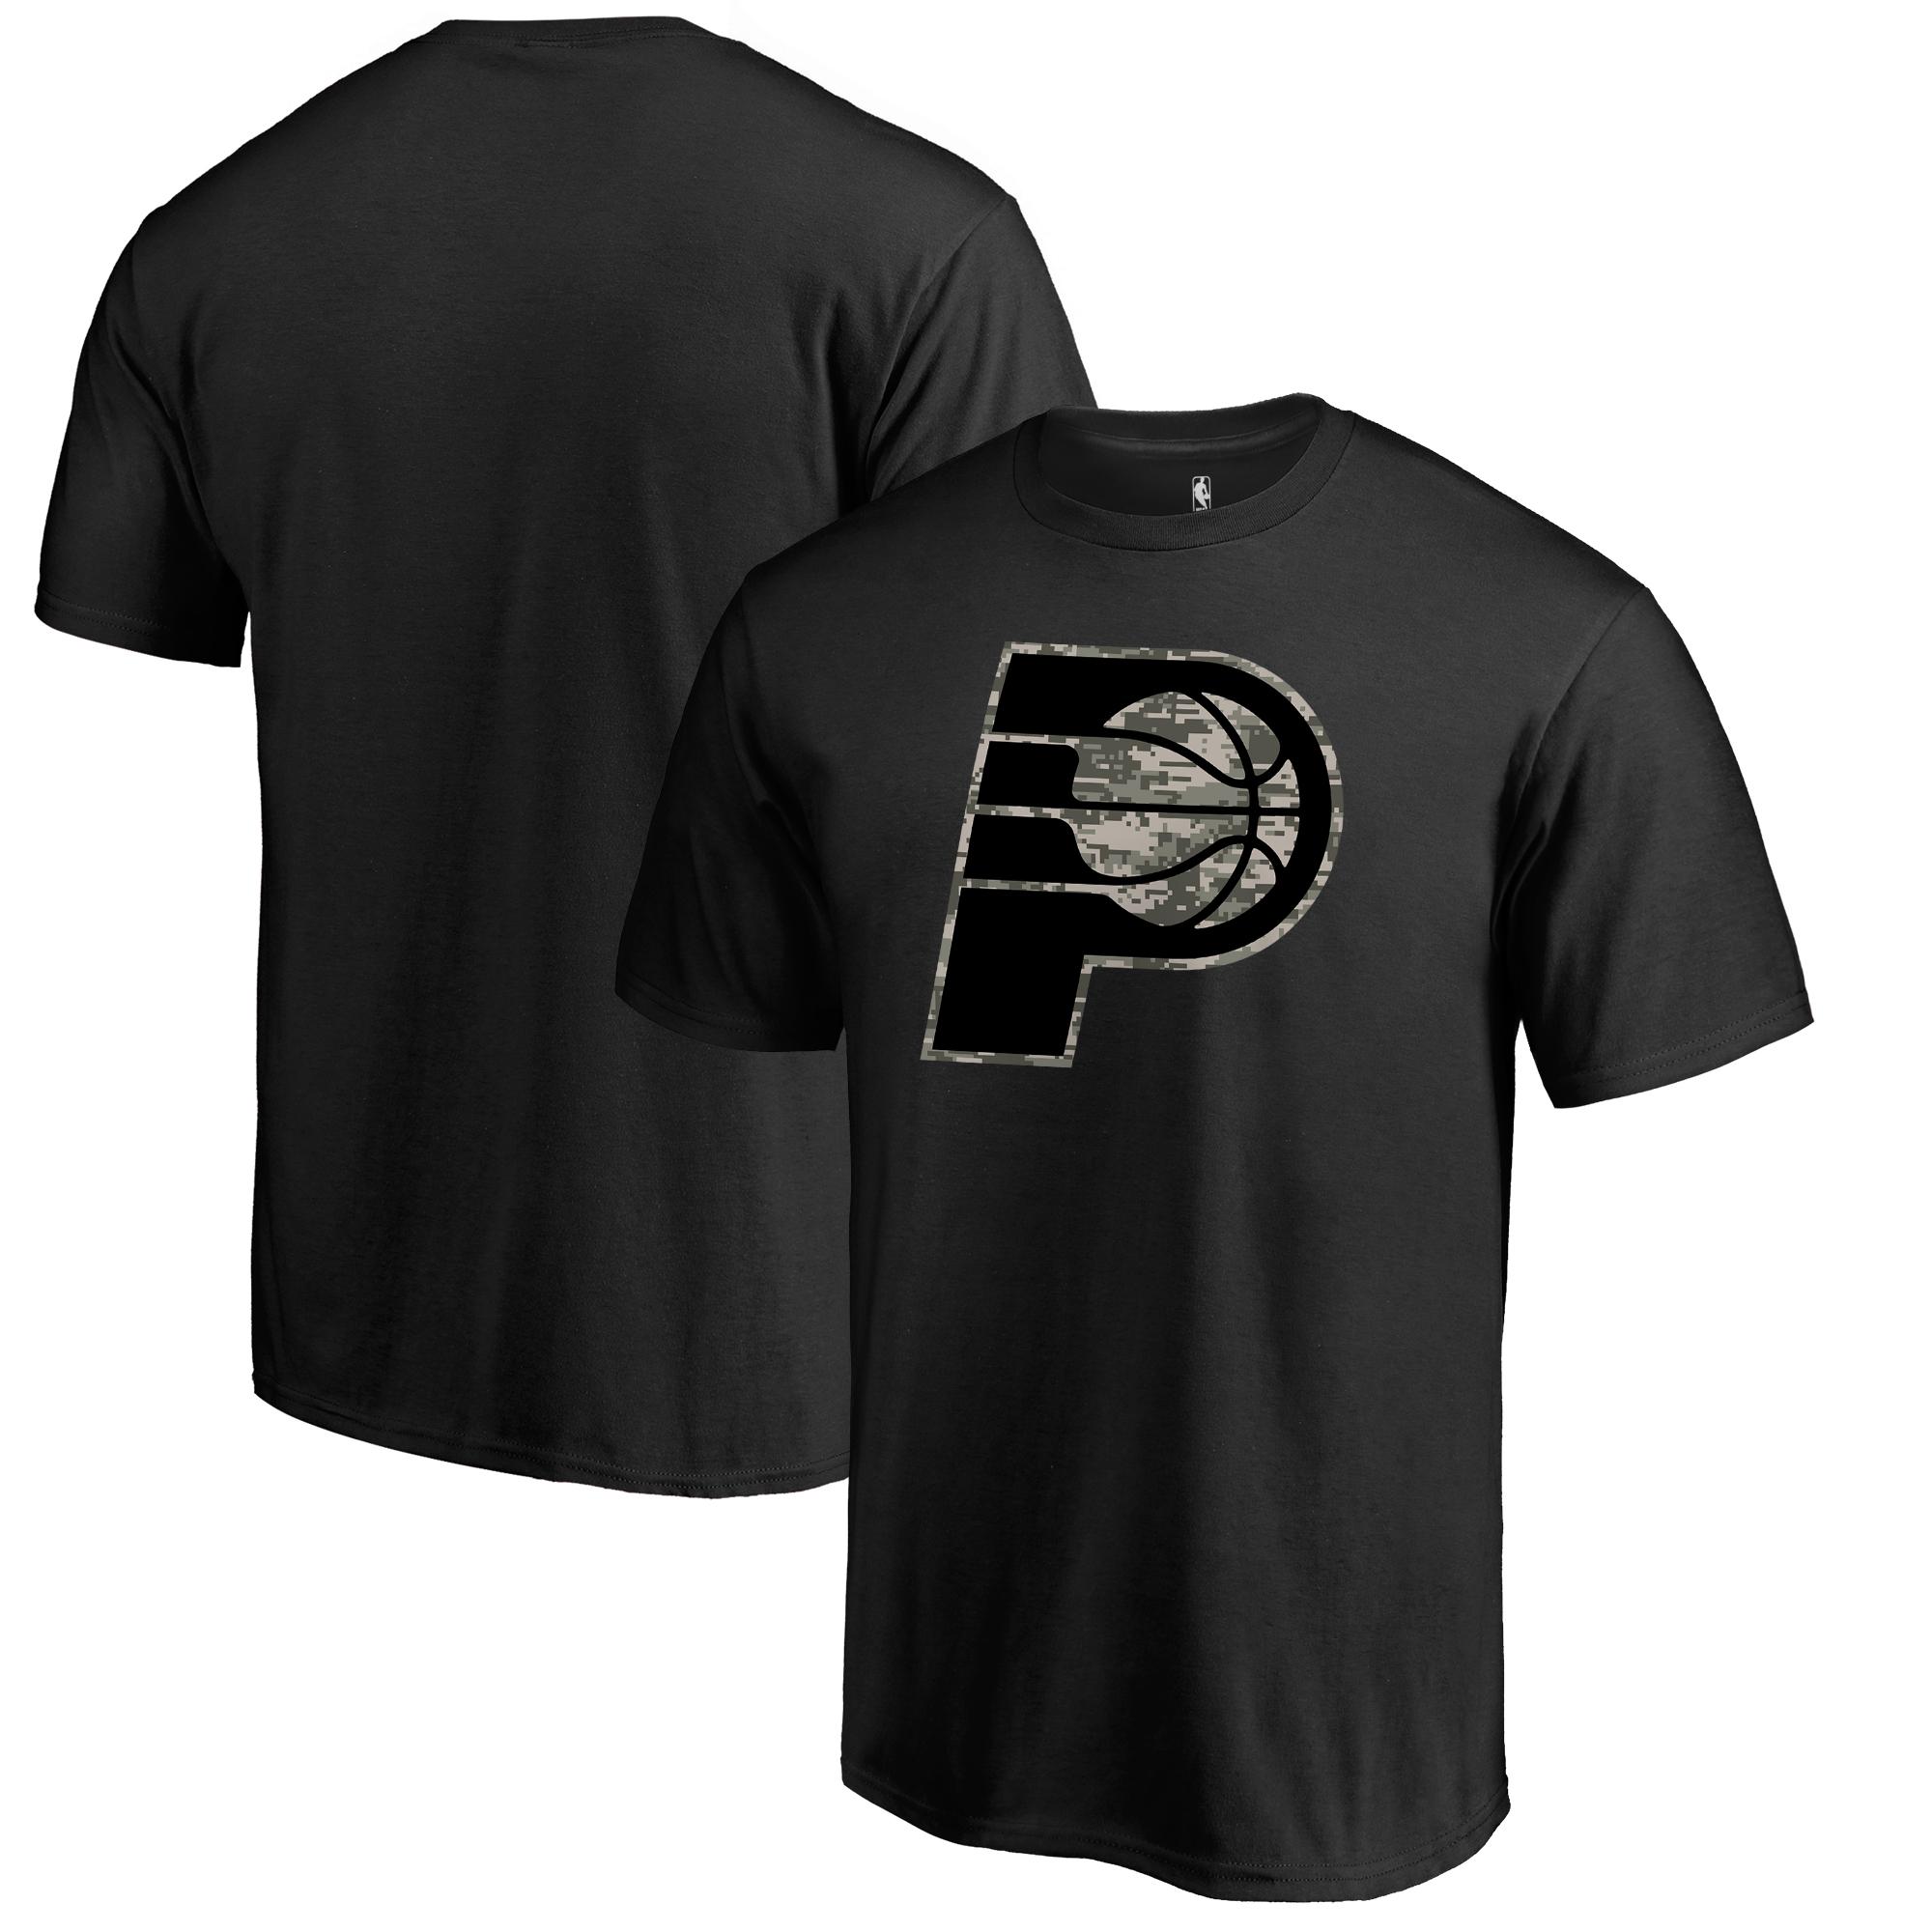 Indiana Pacers Fanatics Branded Big & Tall Cloak Camo T-Shirt - Black